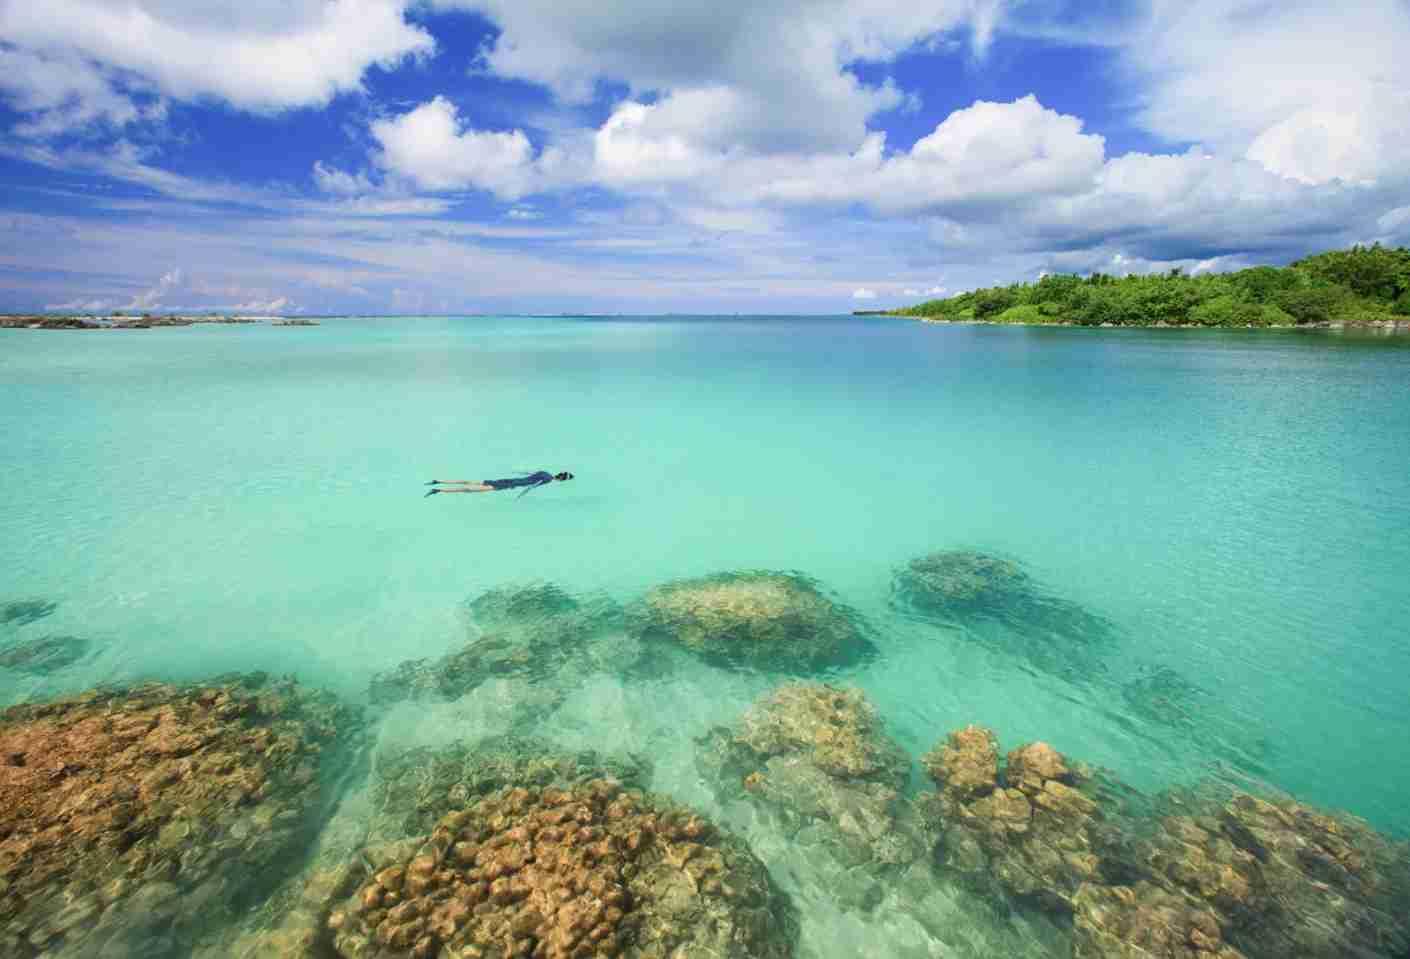 Nias Island. (Photo via Shutterstock)